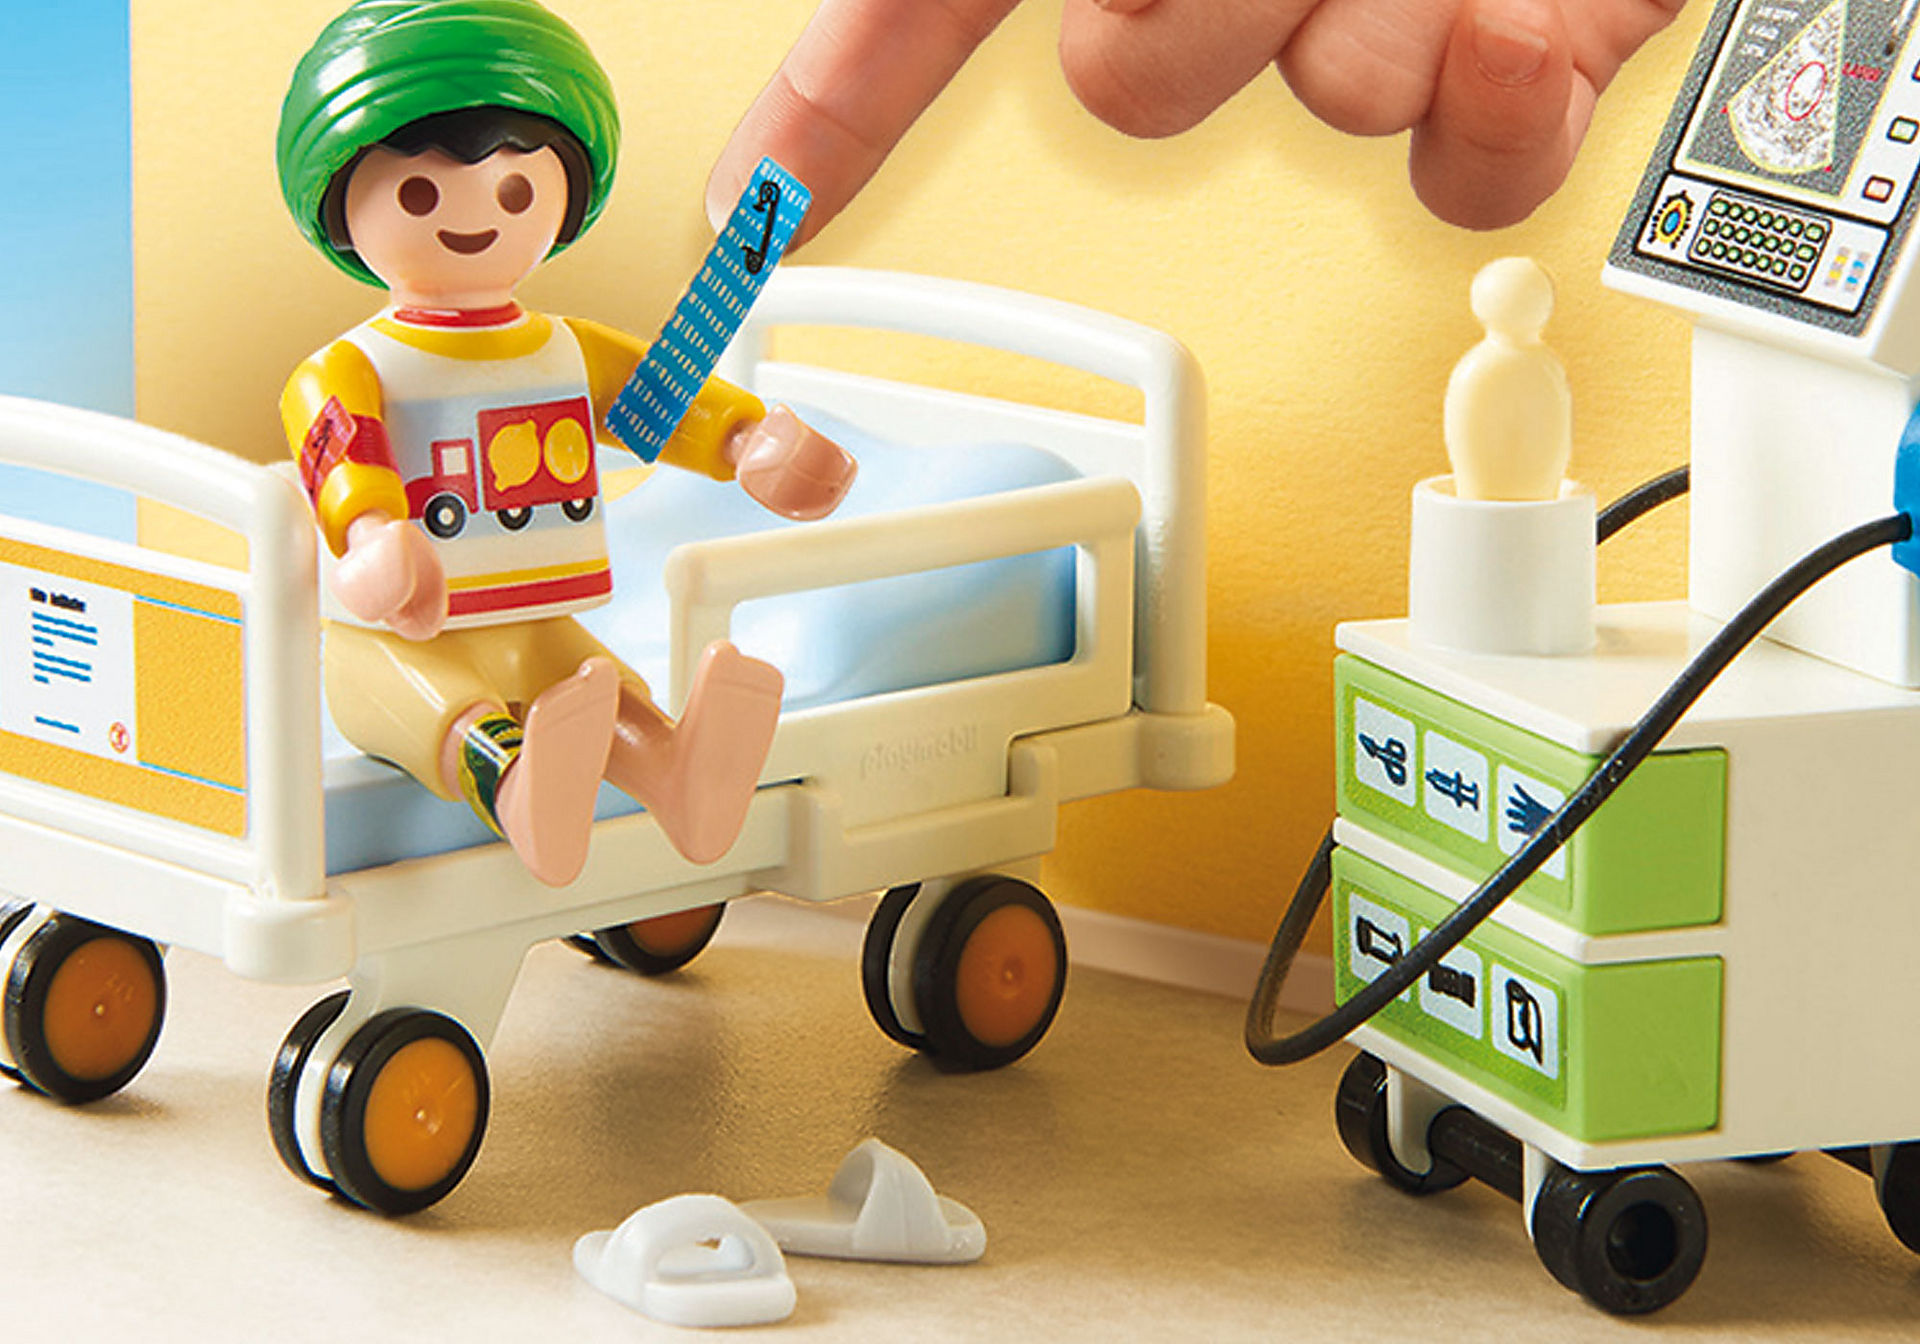 http://media.playmobil.com/i/playmobil/70192_product_extra1/Kinderkrankenzimmer